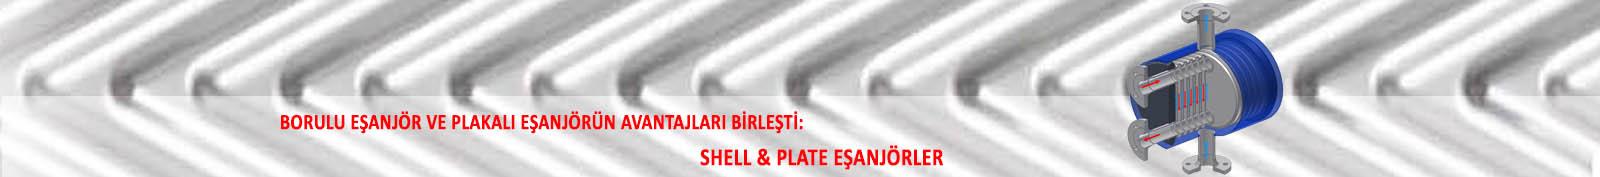 Shell-Plate Eşanjörler